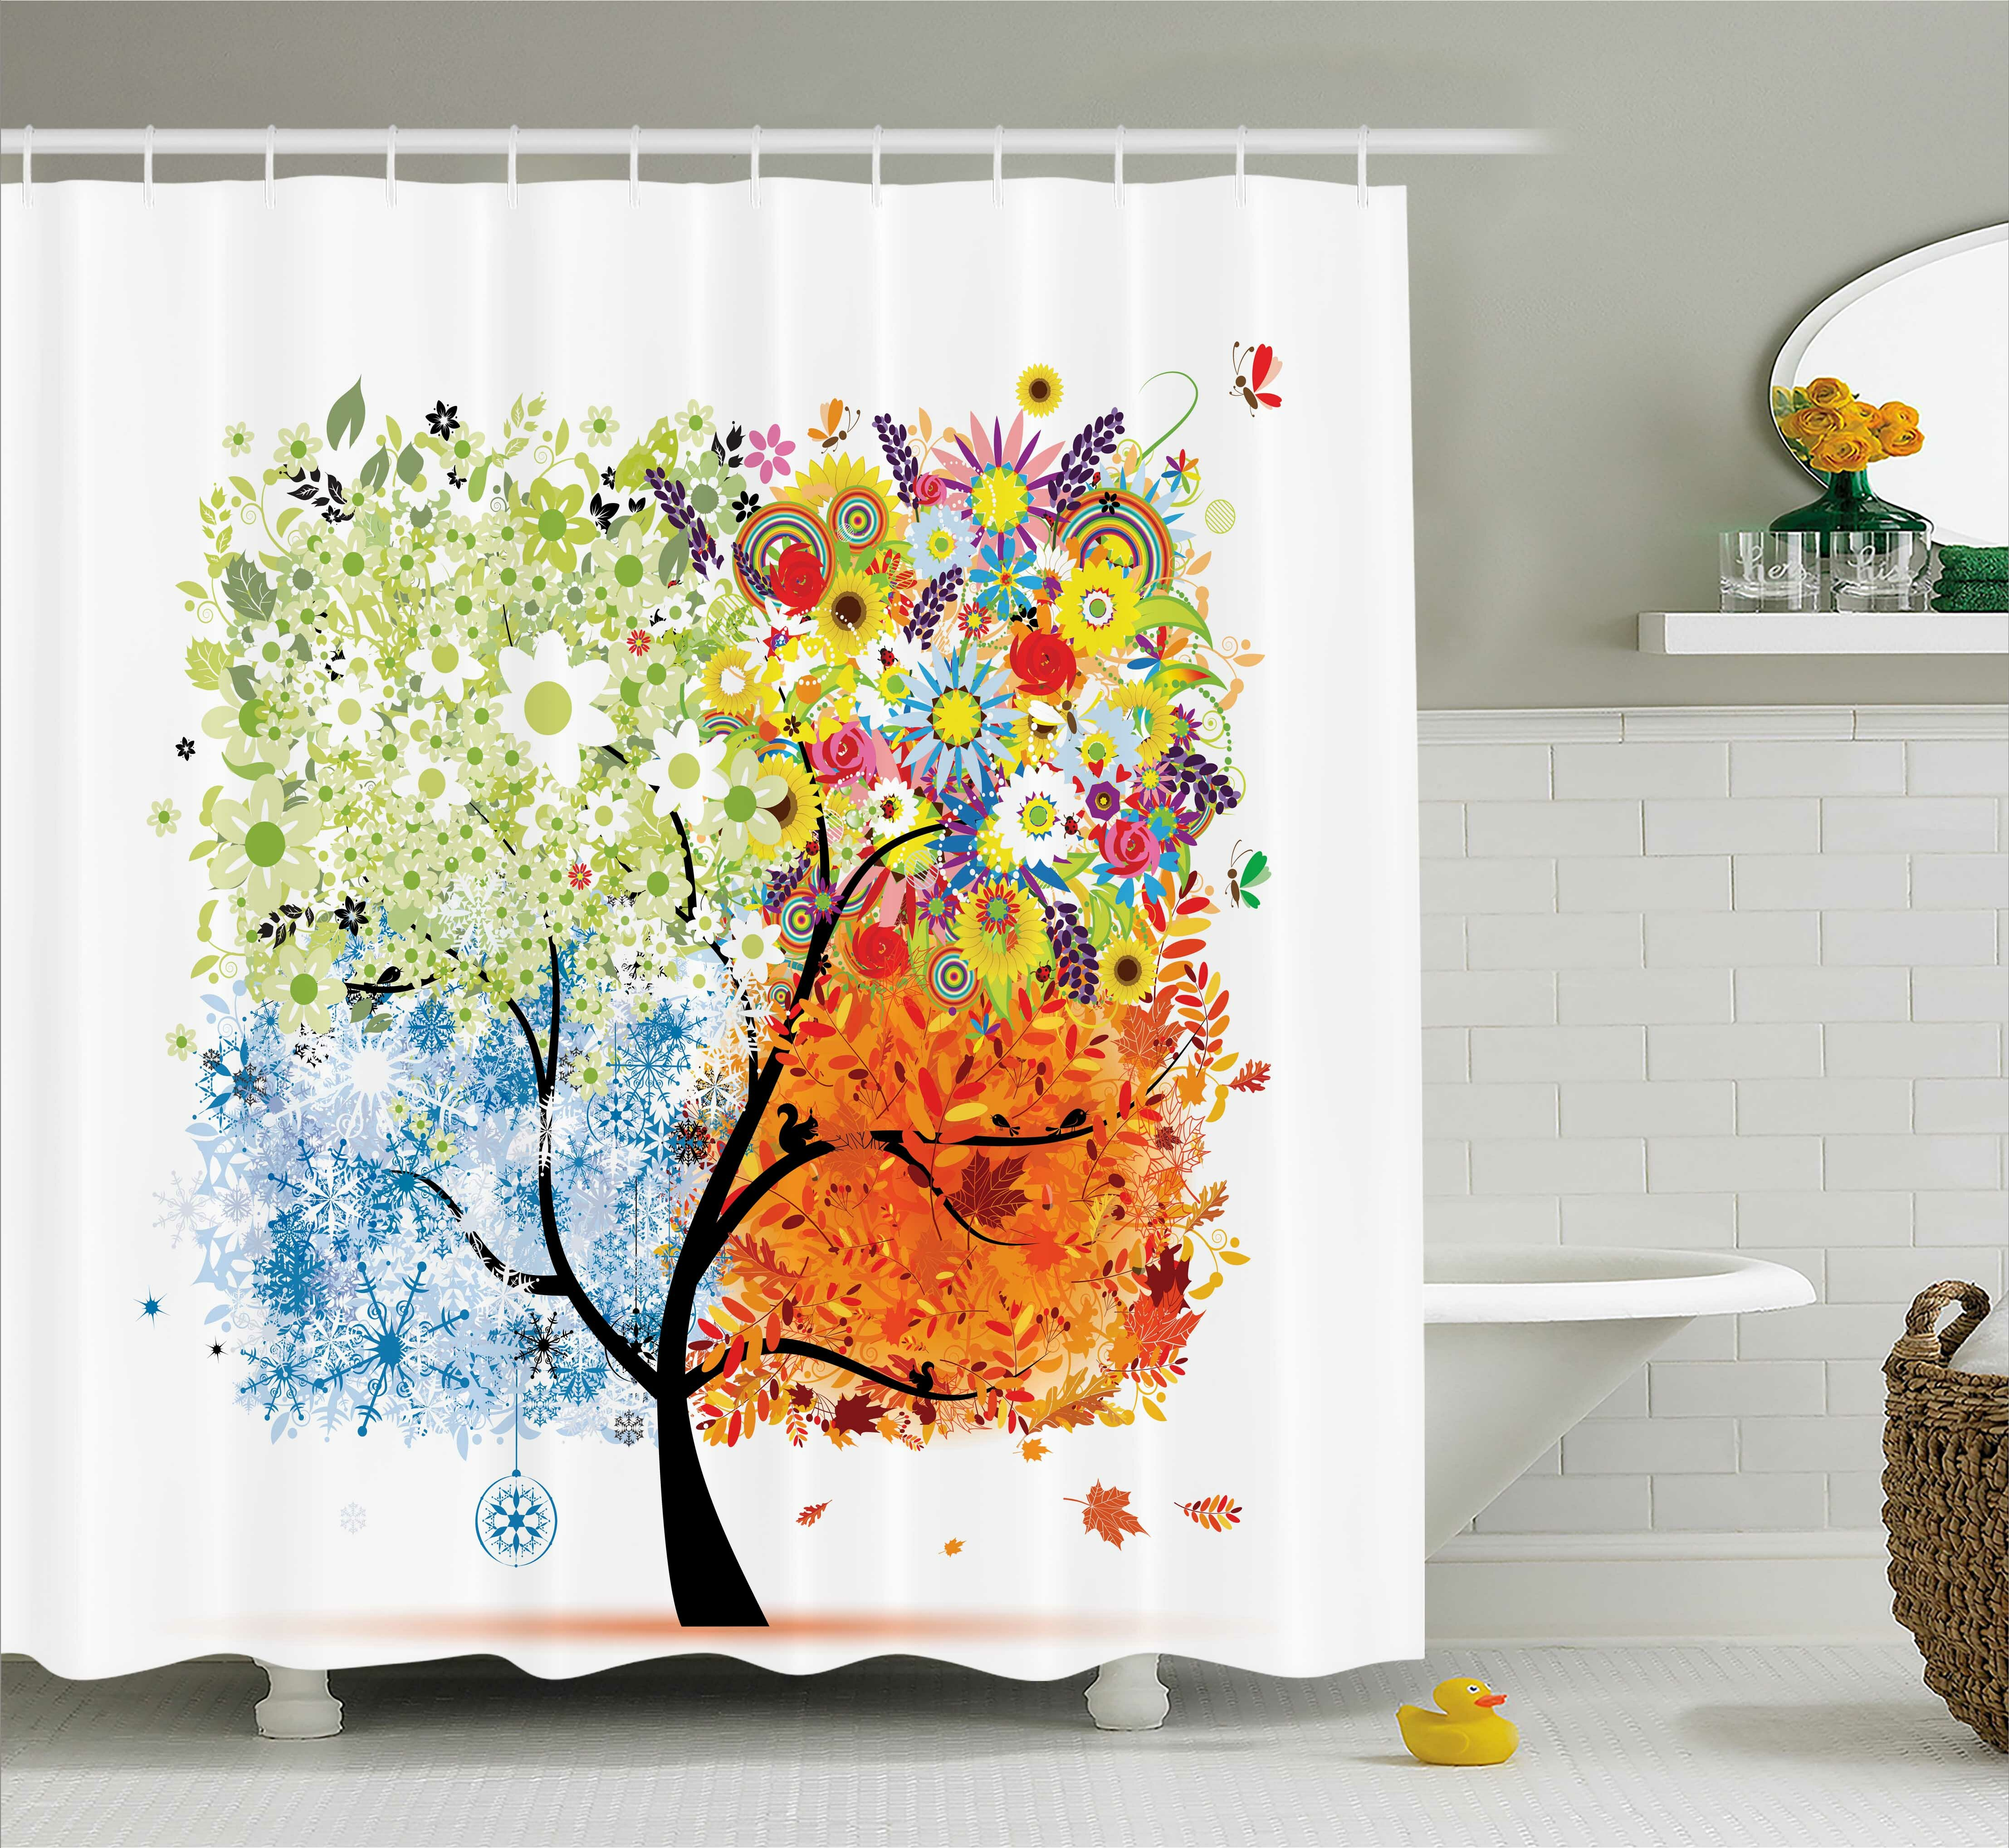 Ebern Designs Gina Season Tree Branches With Flowers Spring Summer Autumn Winter Theme Artwork Single Shower Curtain Wayfair